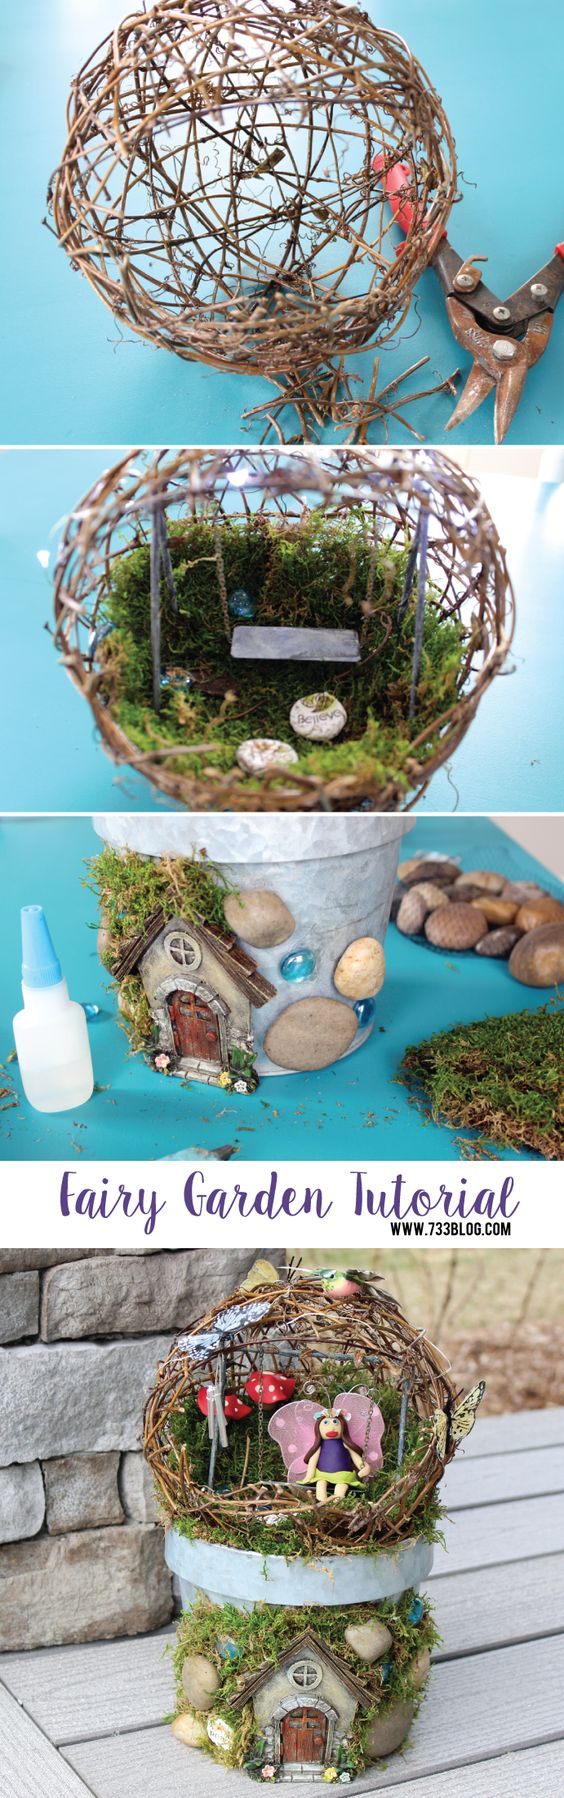 45 Fairy Garden Houses